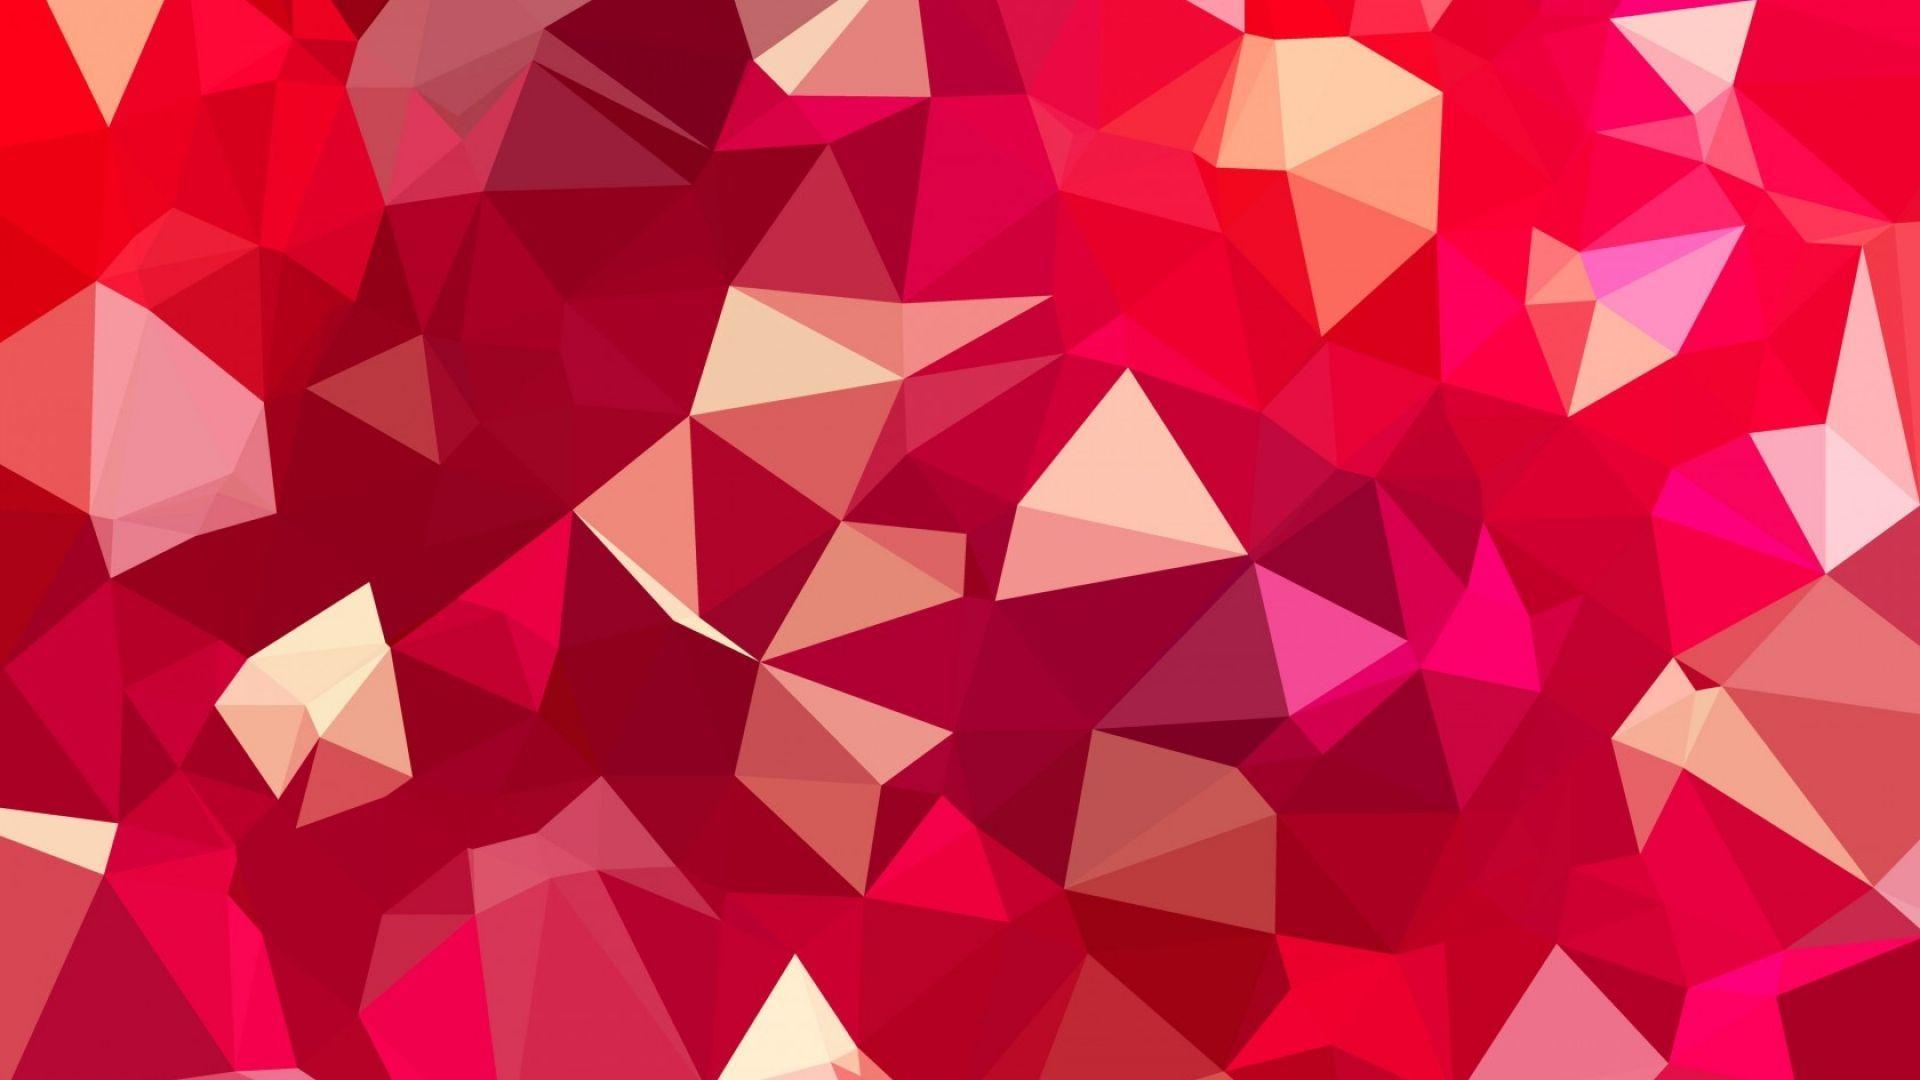 Full HD 1080p Geometry Wallpapers Desktop Backgrounds